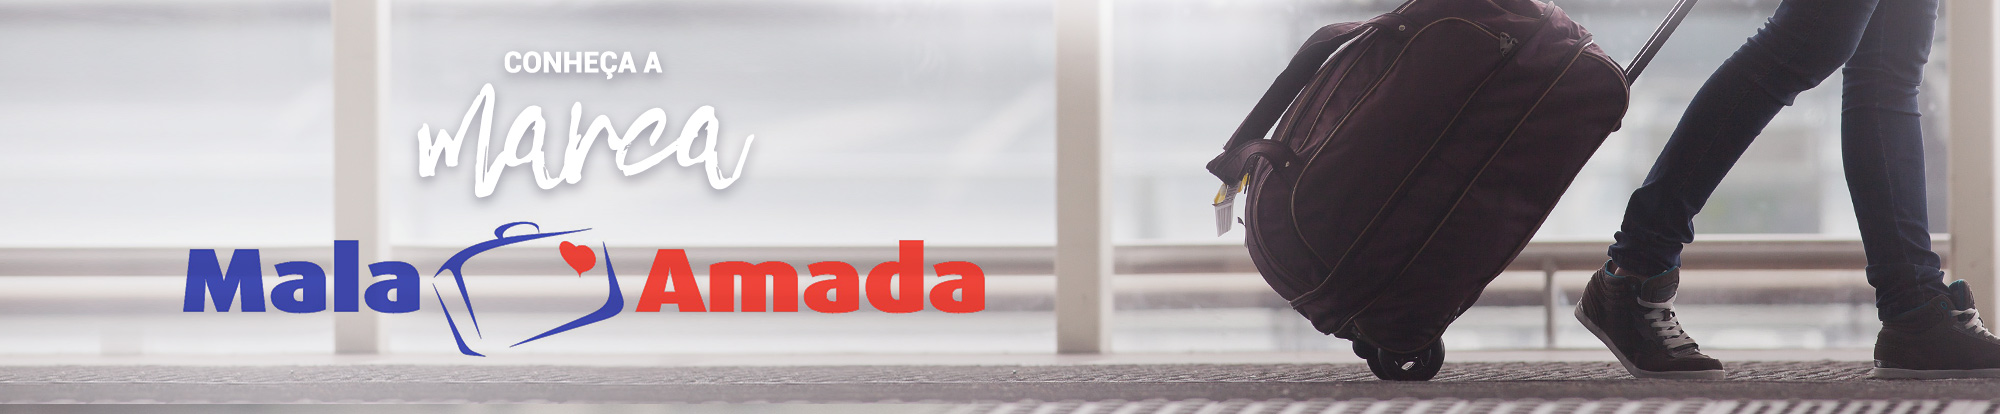 Banner Mala Amada